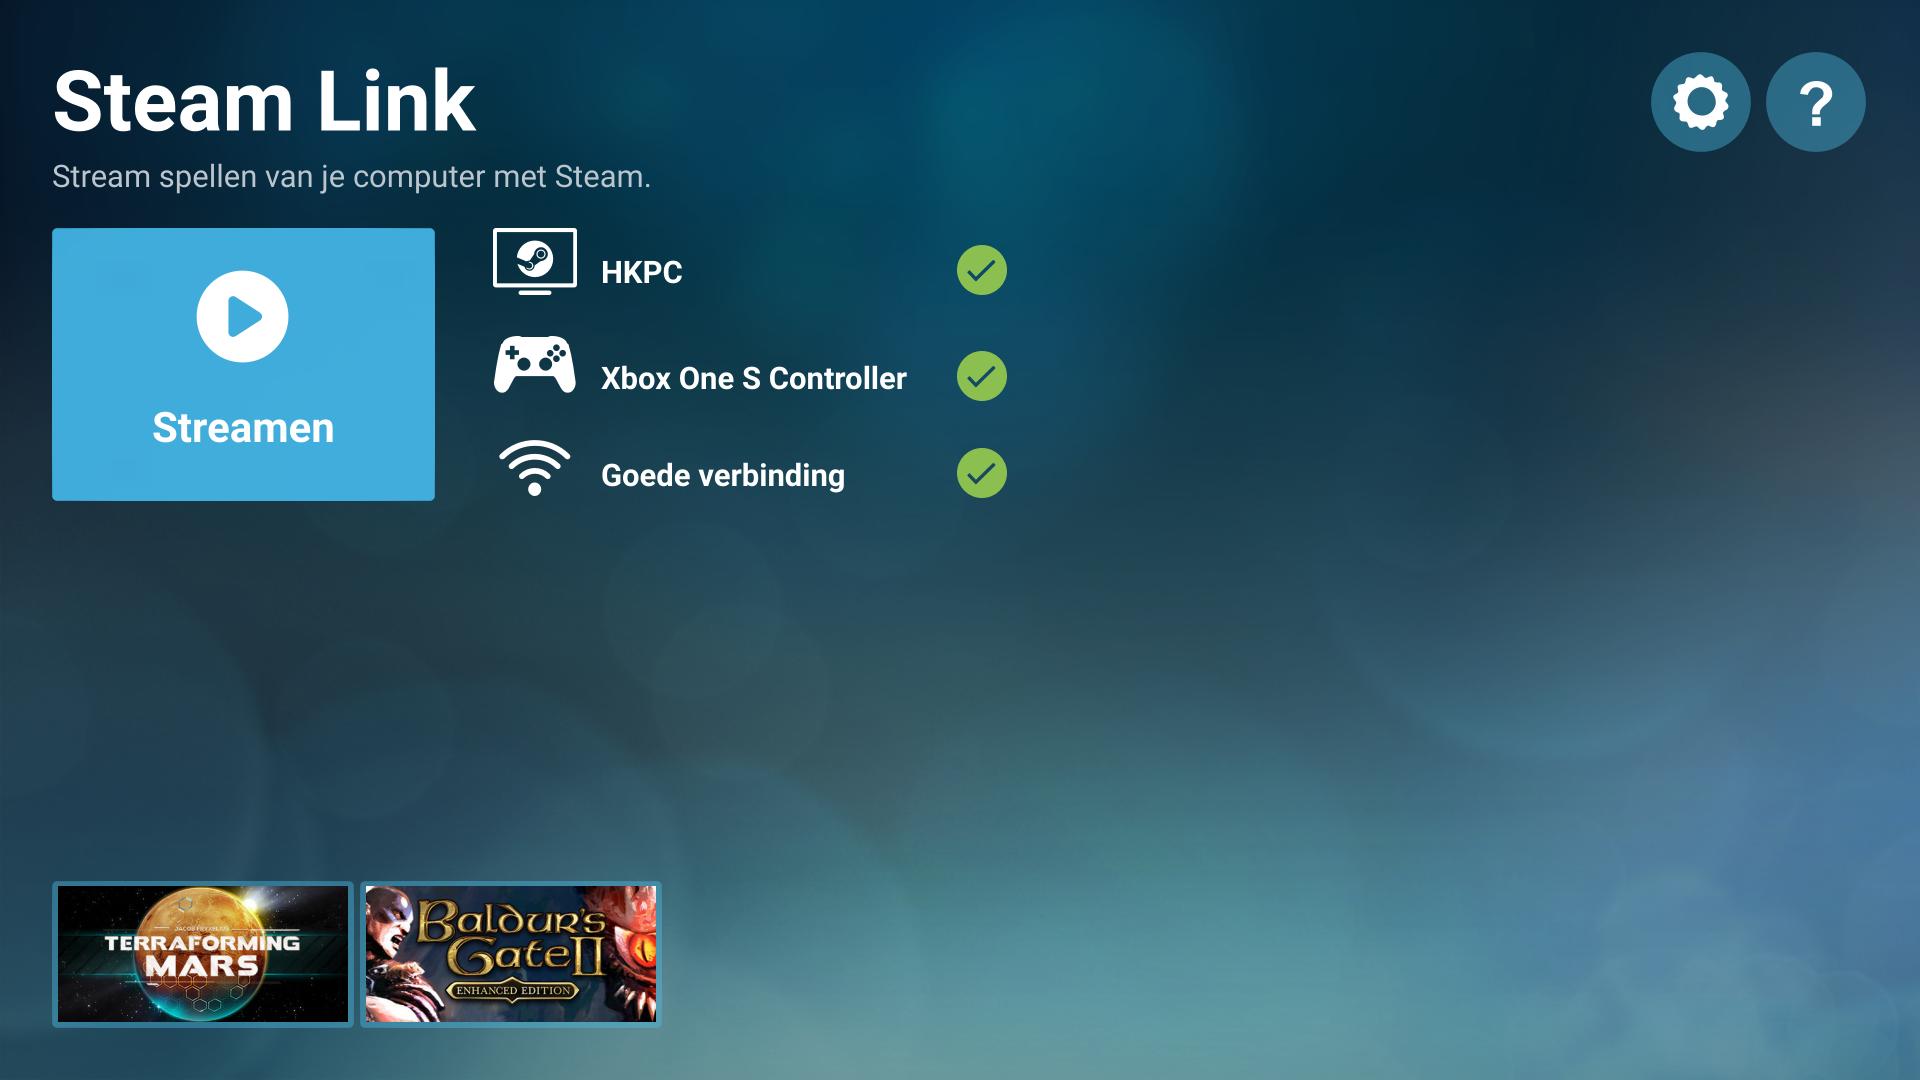 Chromebook pc Steam game Steam Link